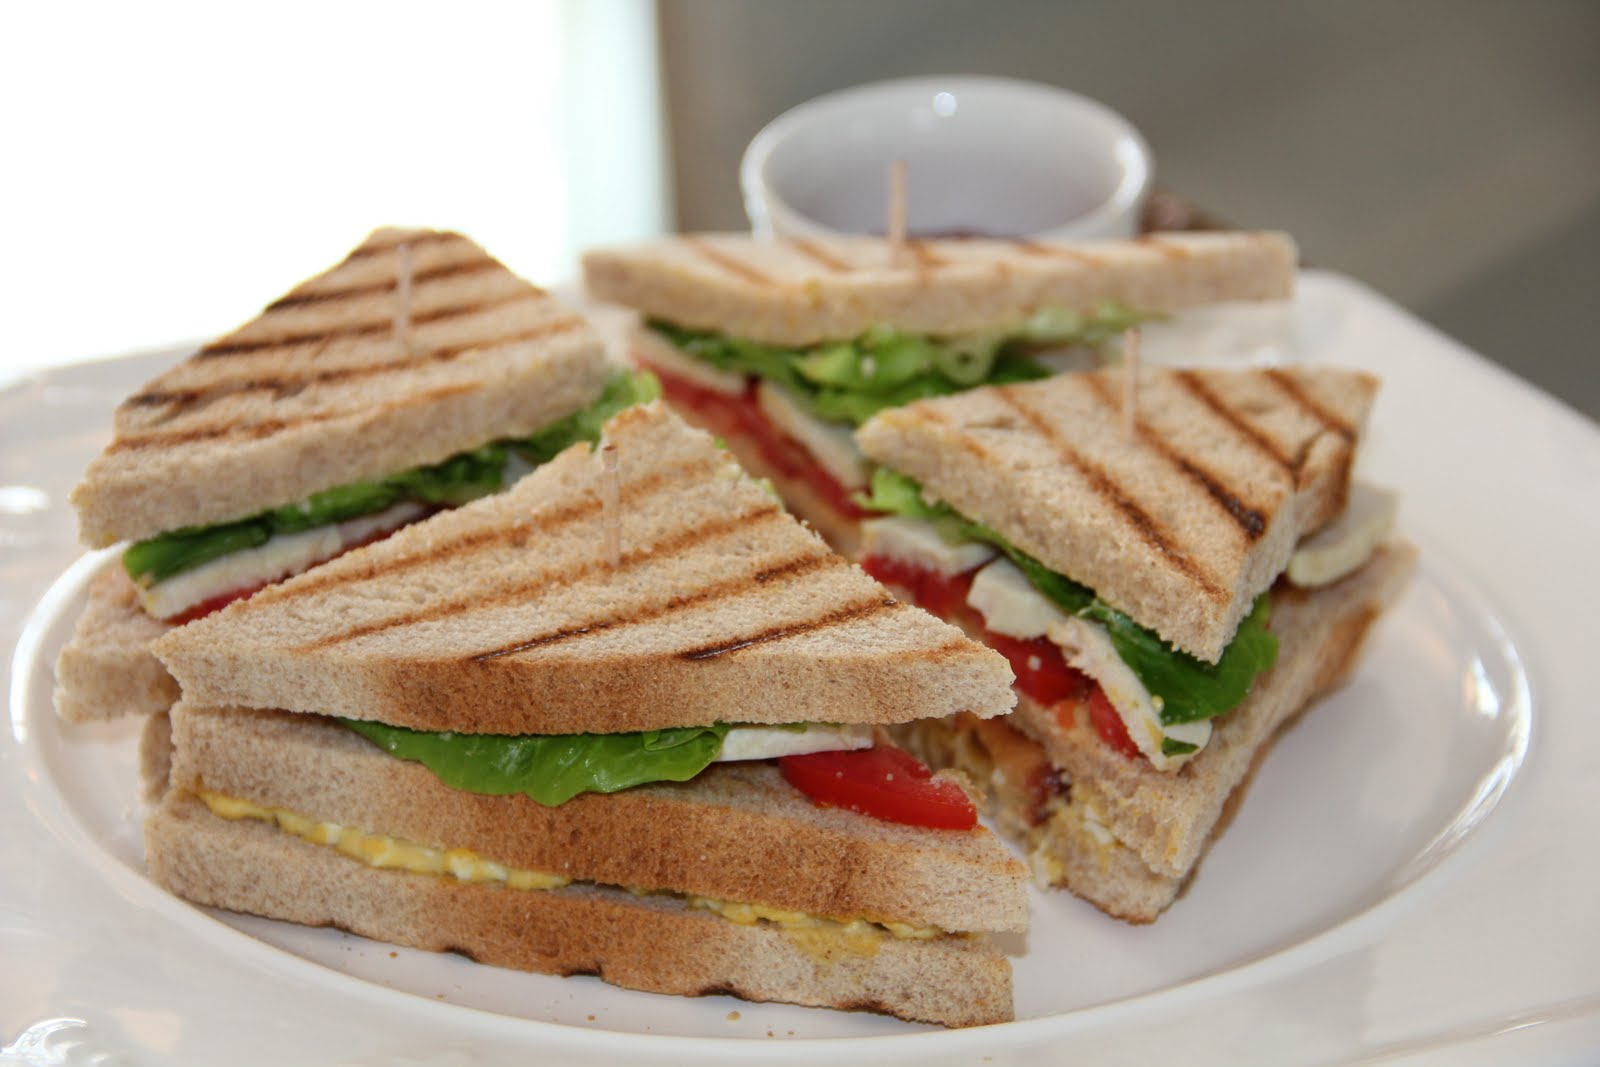 Sandwich Grilled Veg Club Sandwich 1645846 Hd Wallpaper Backgrounds Download